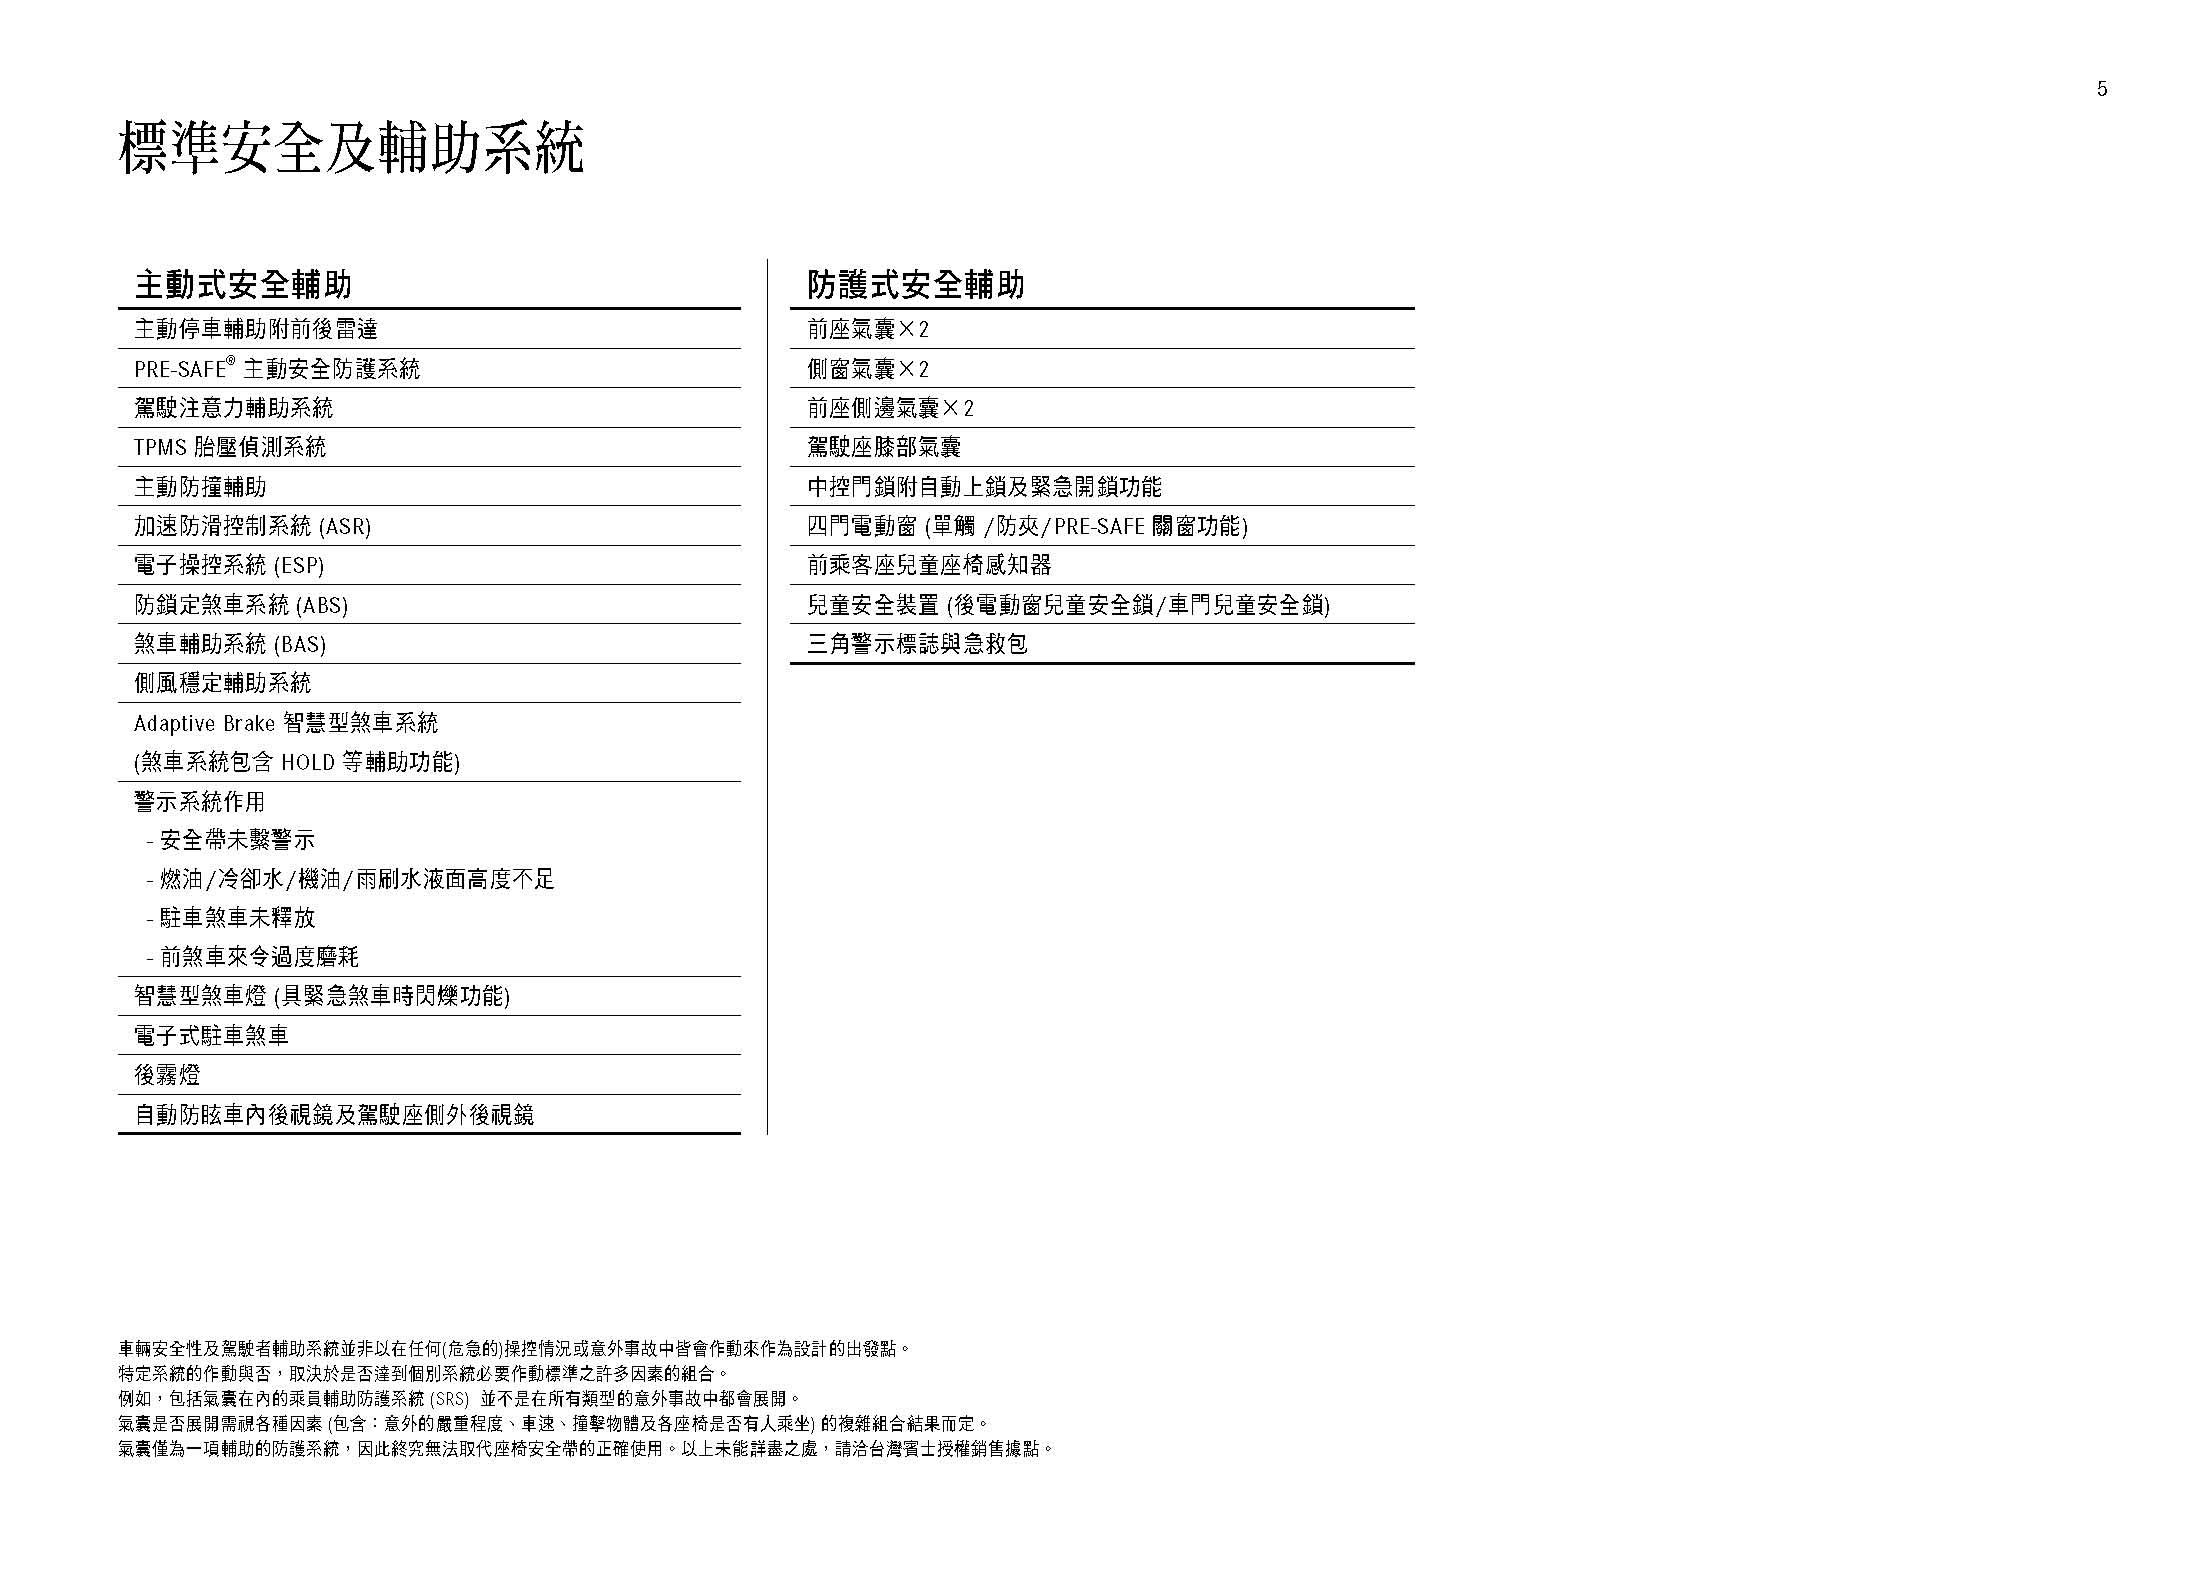 MY1718_GLC規格配備表20170929_頁面_05